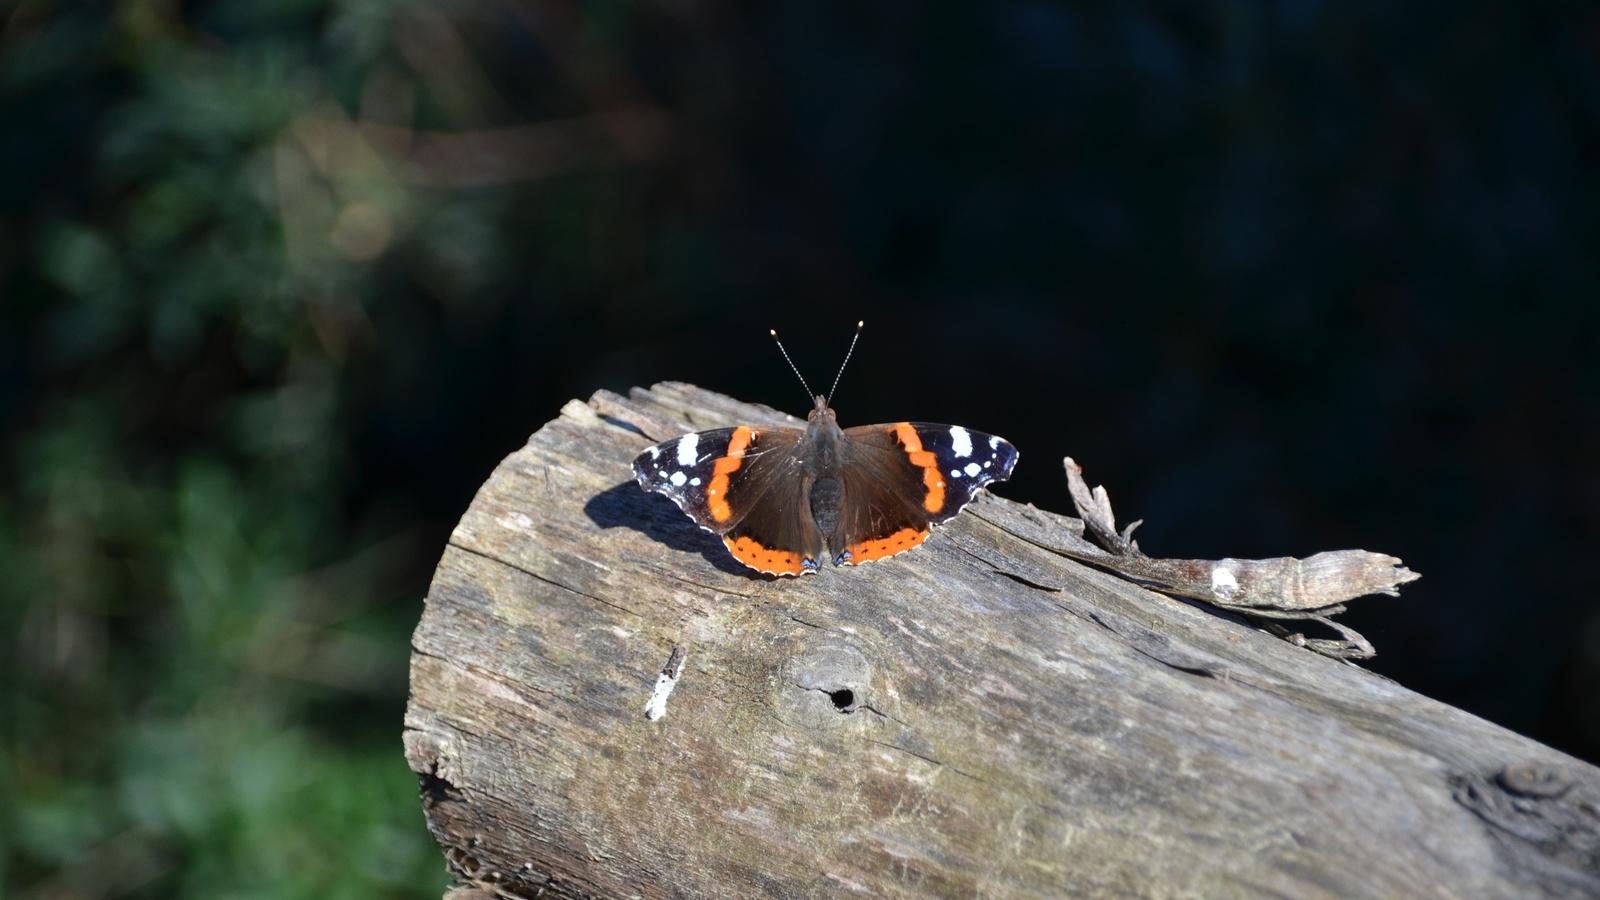 бабочка, бревно, композиция